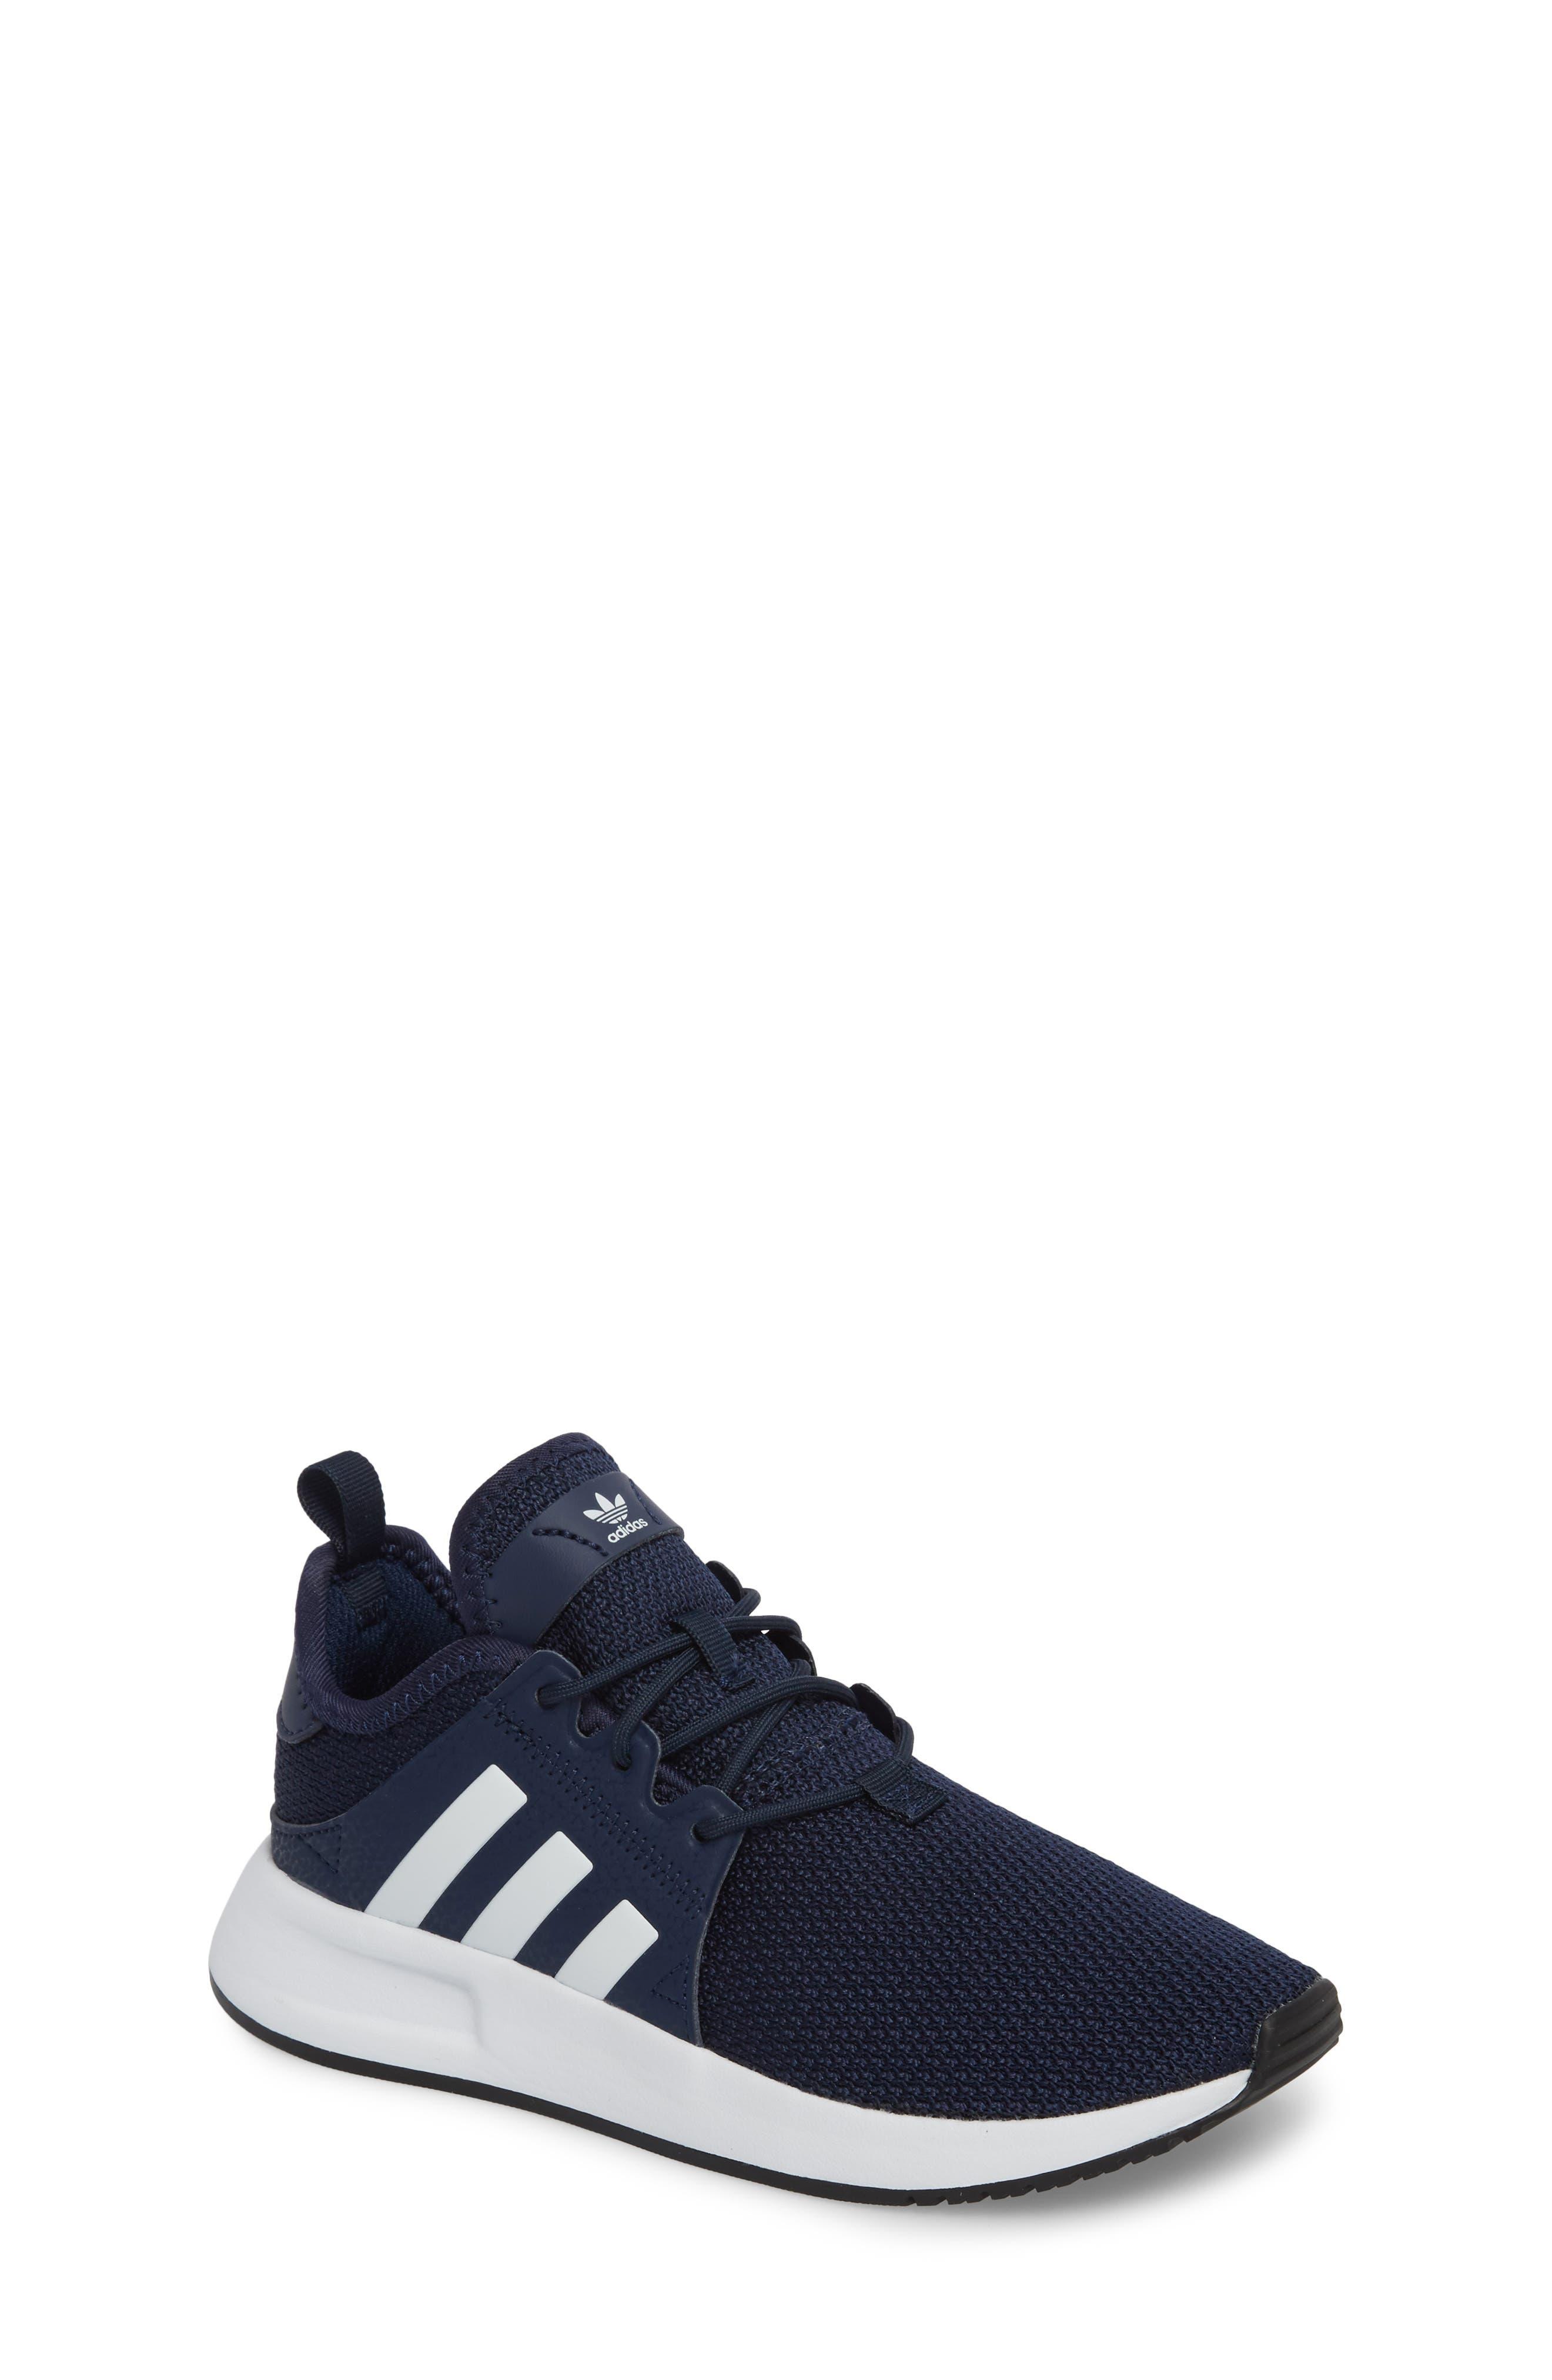 ADIDAS, X_PLR Sneaker, Main thumbnail 1, color, COLLEGIATE NAVY/ WHITE